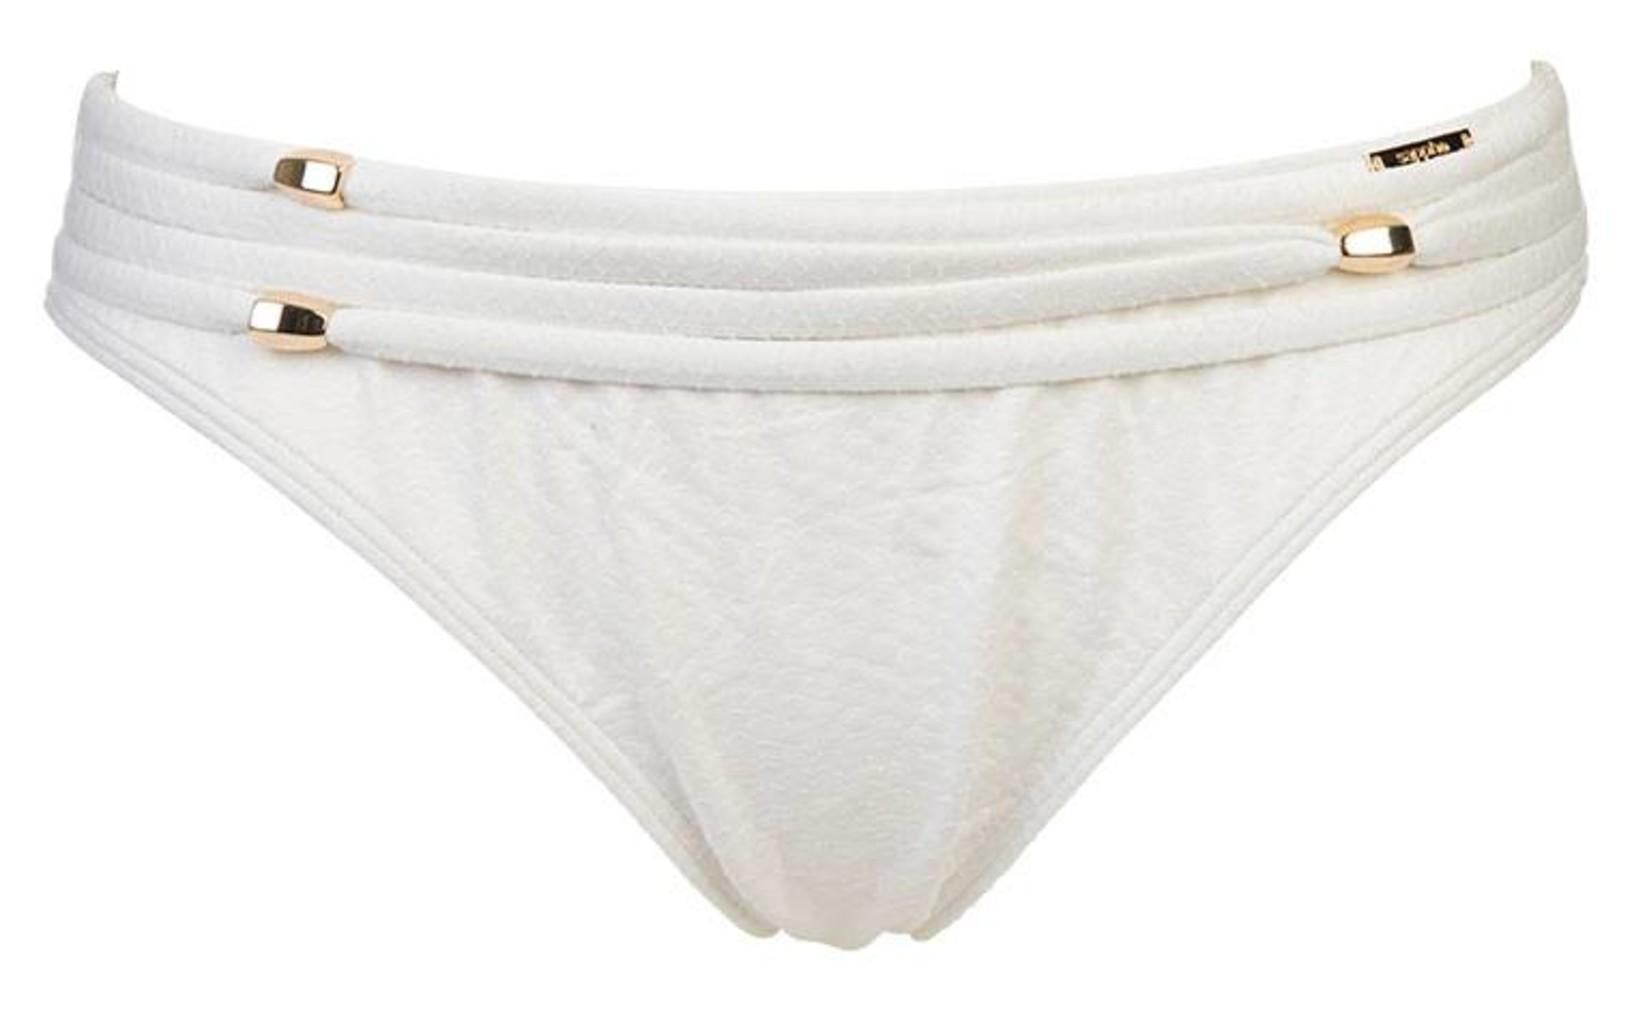 Sapph Sapph Beach Vanilla stijlvolle  bikinislip kleur Offwhite